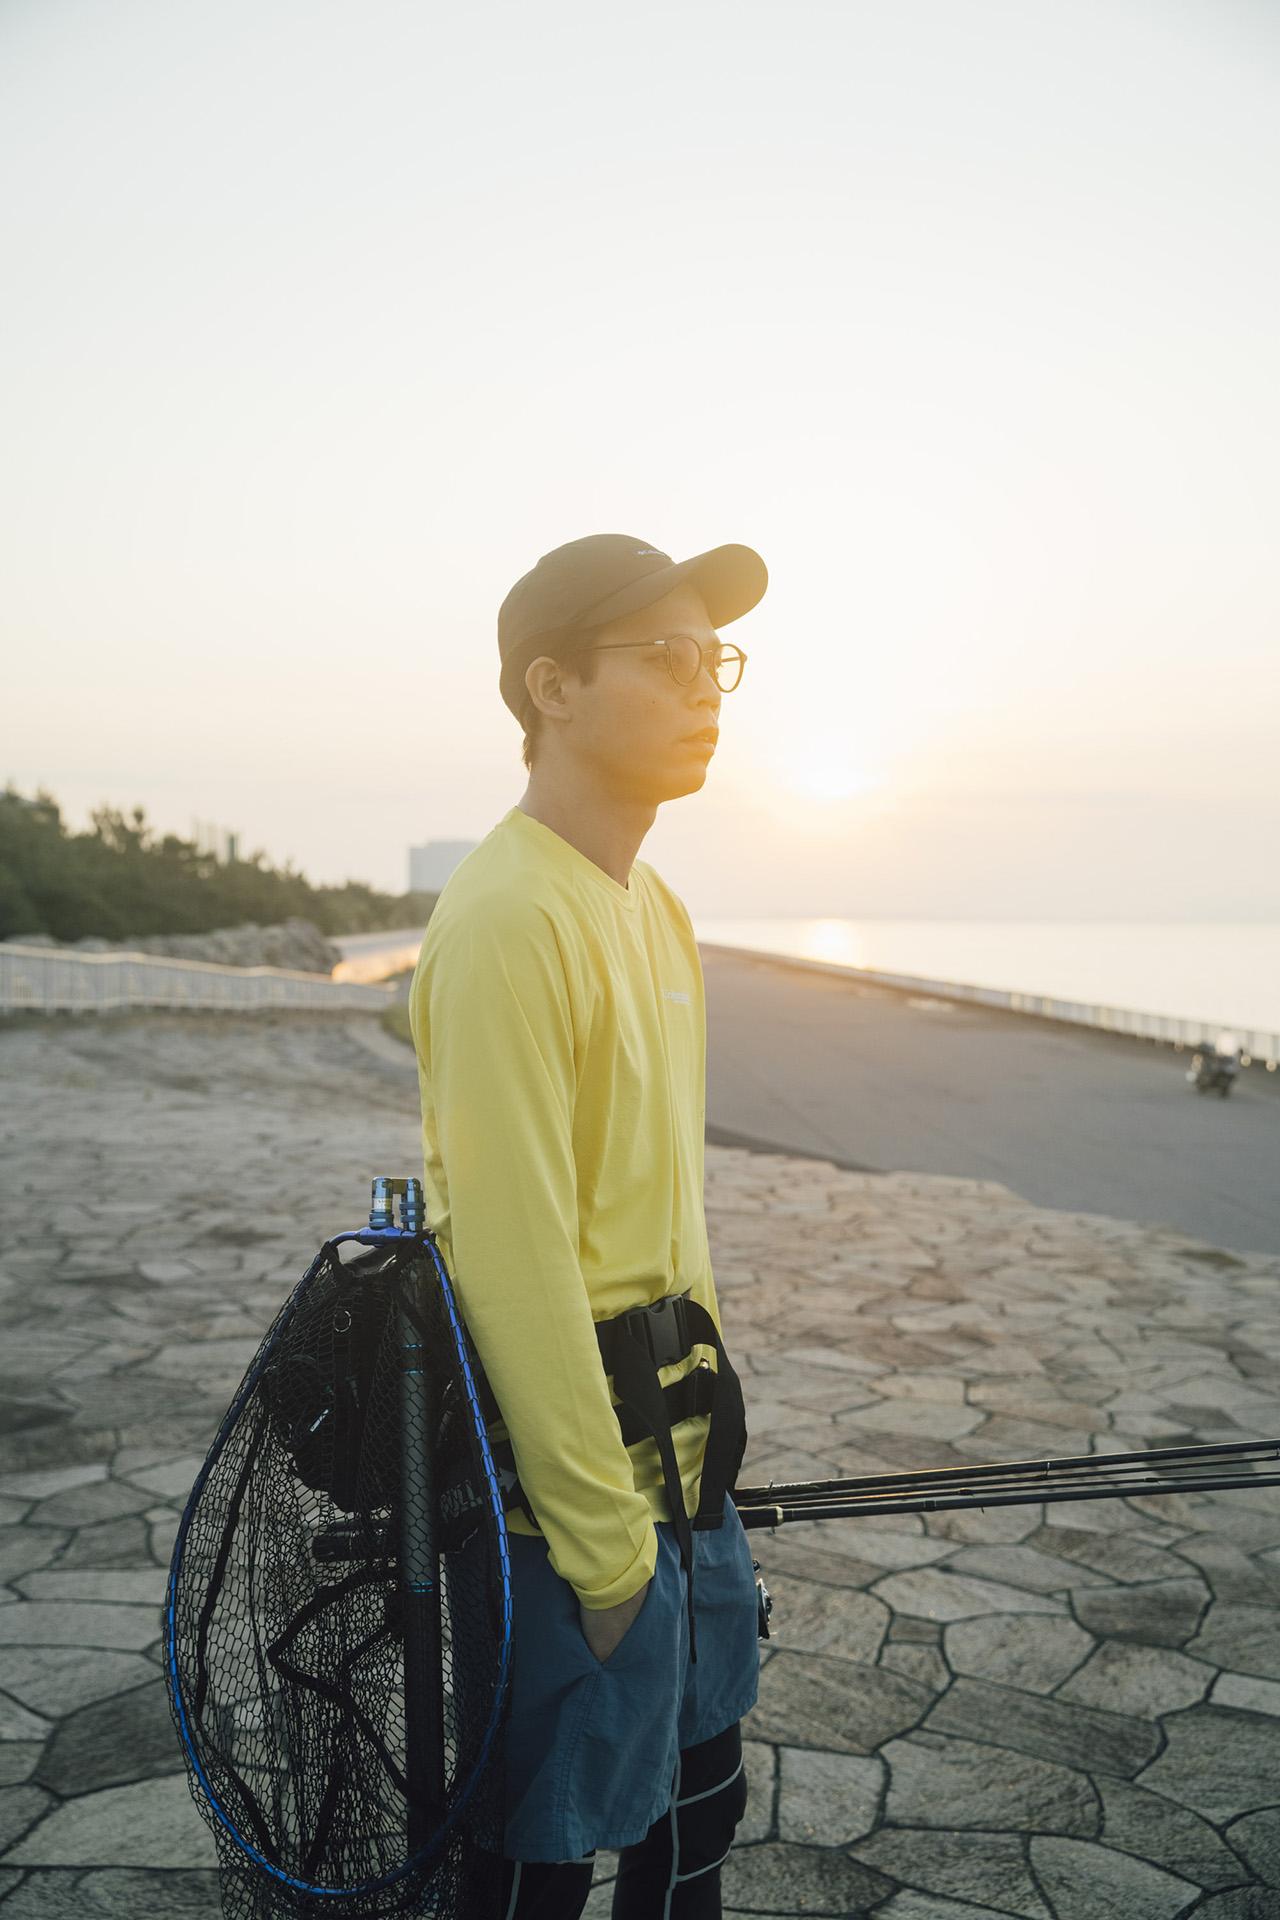 12 Yogee New Waves・粕谷哲司の音楽と釣りを愛するライフスタイル